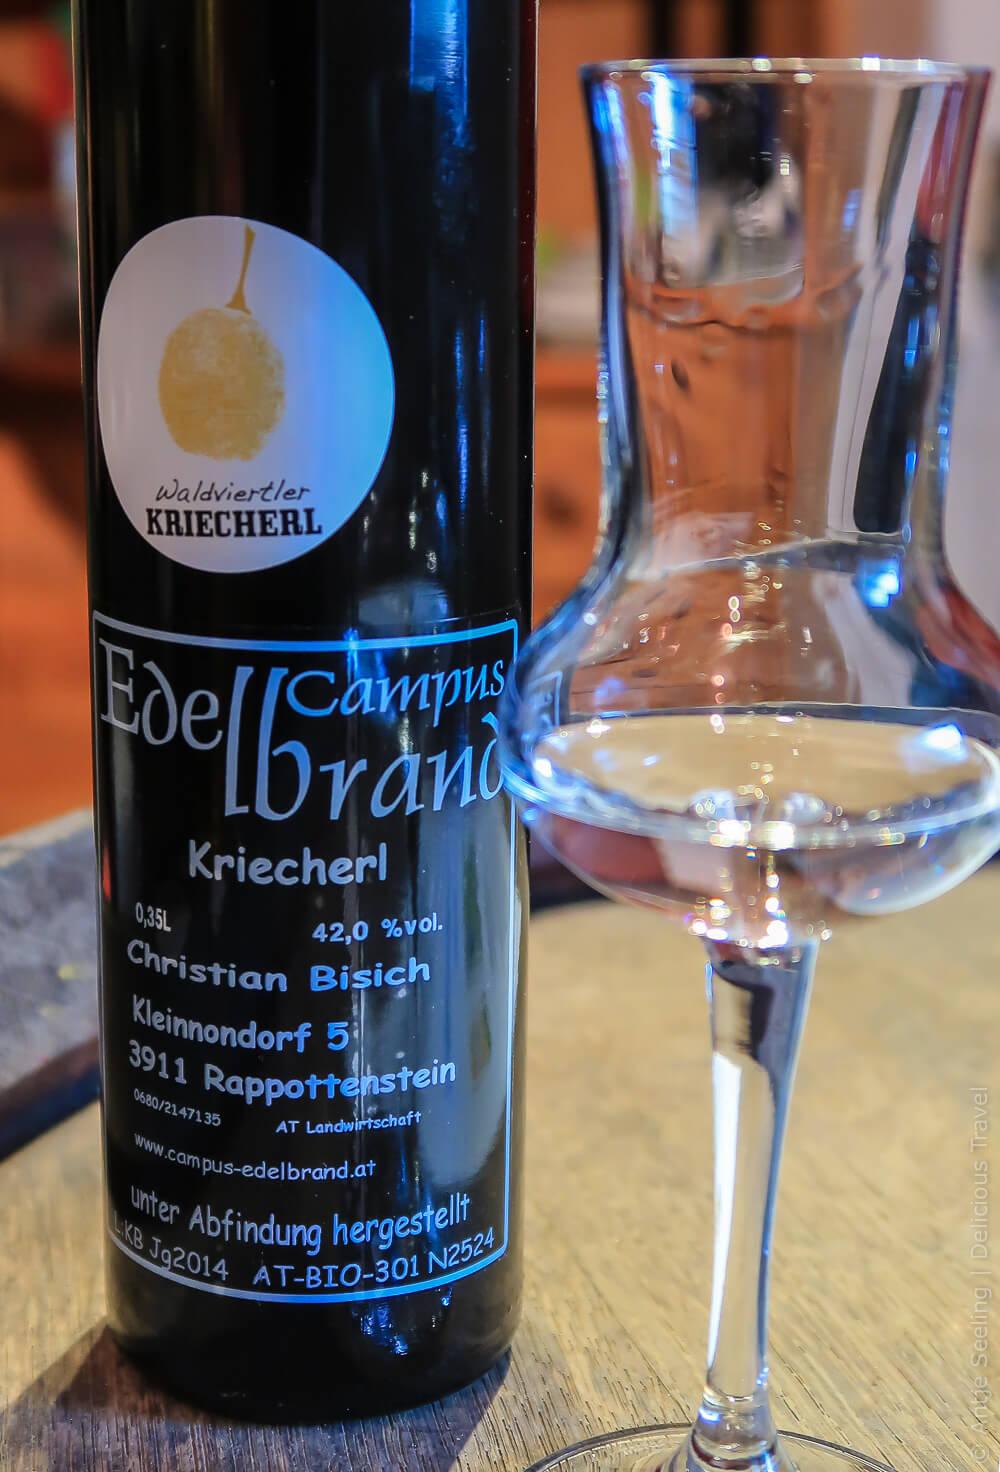 Kriecherl-Brand